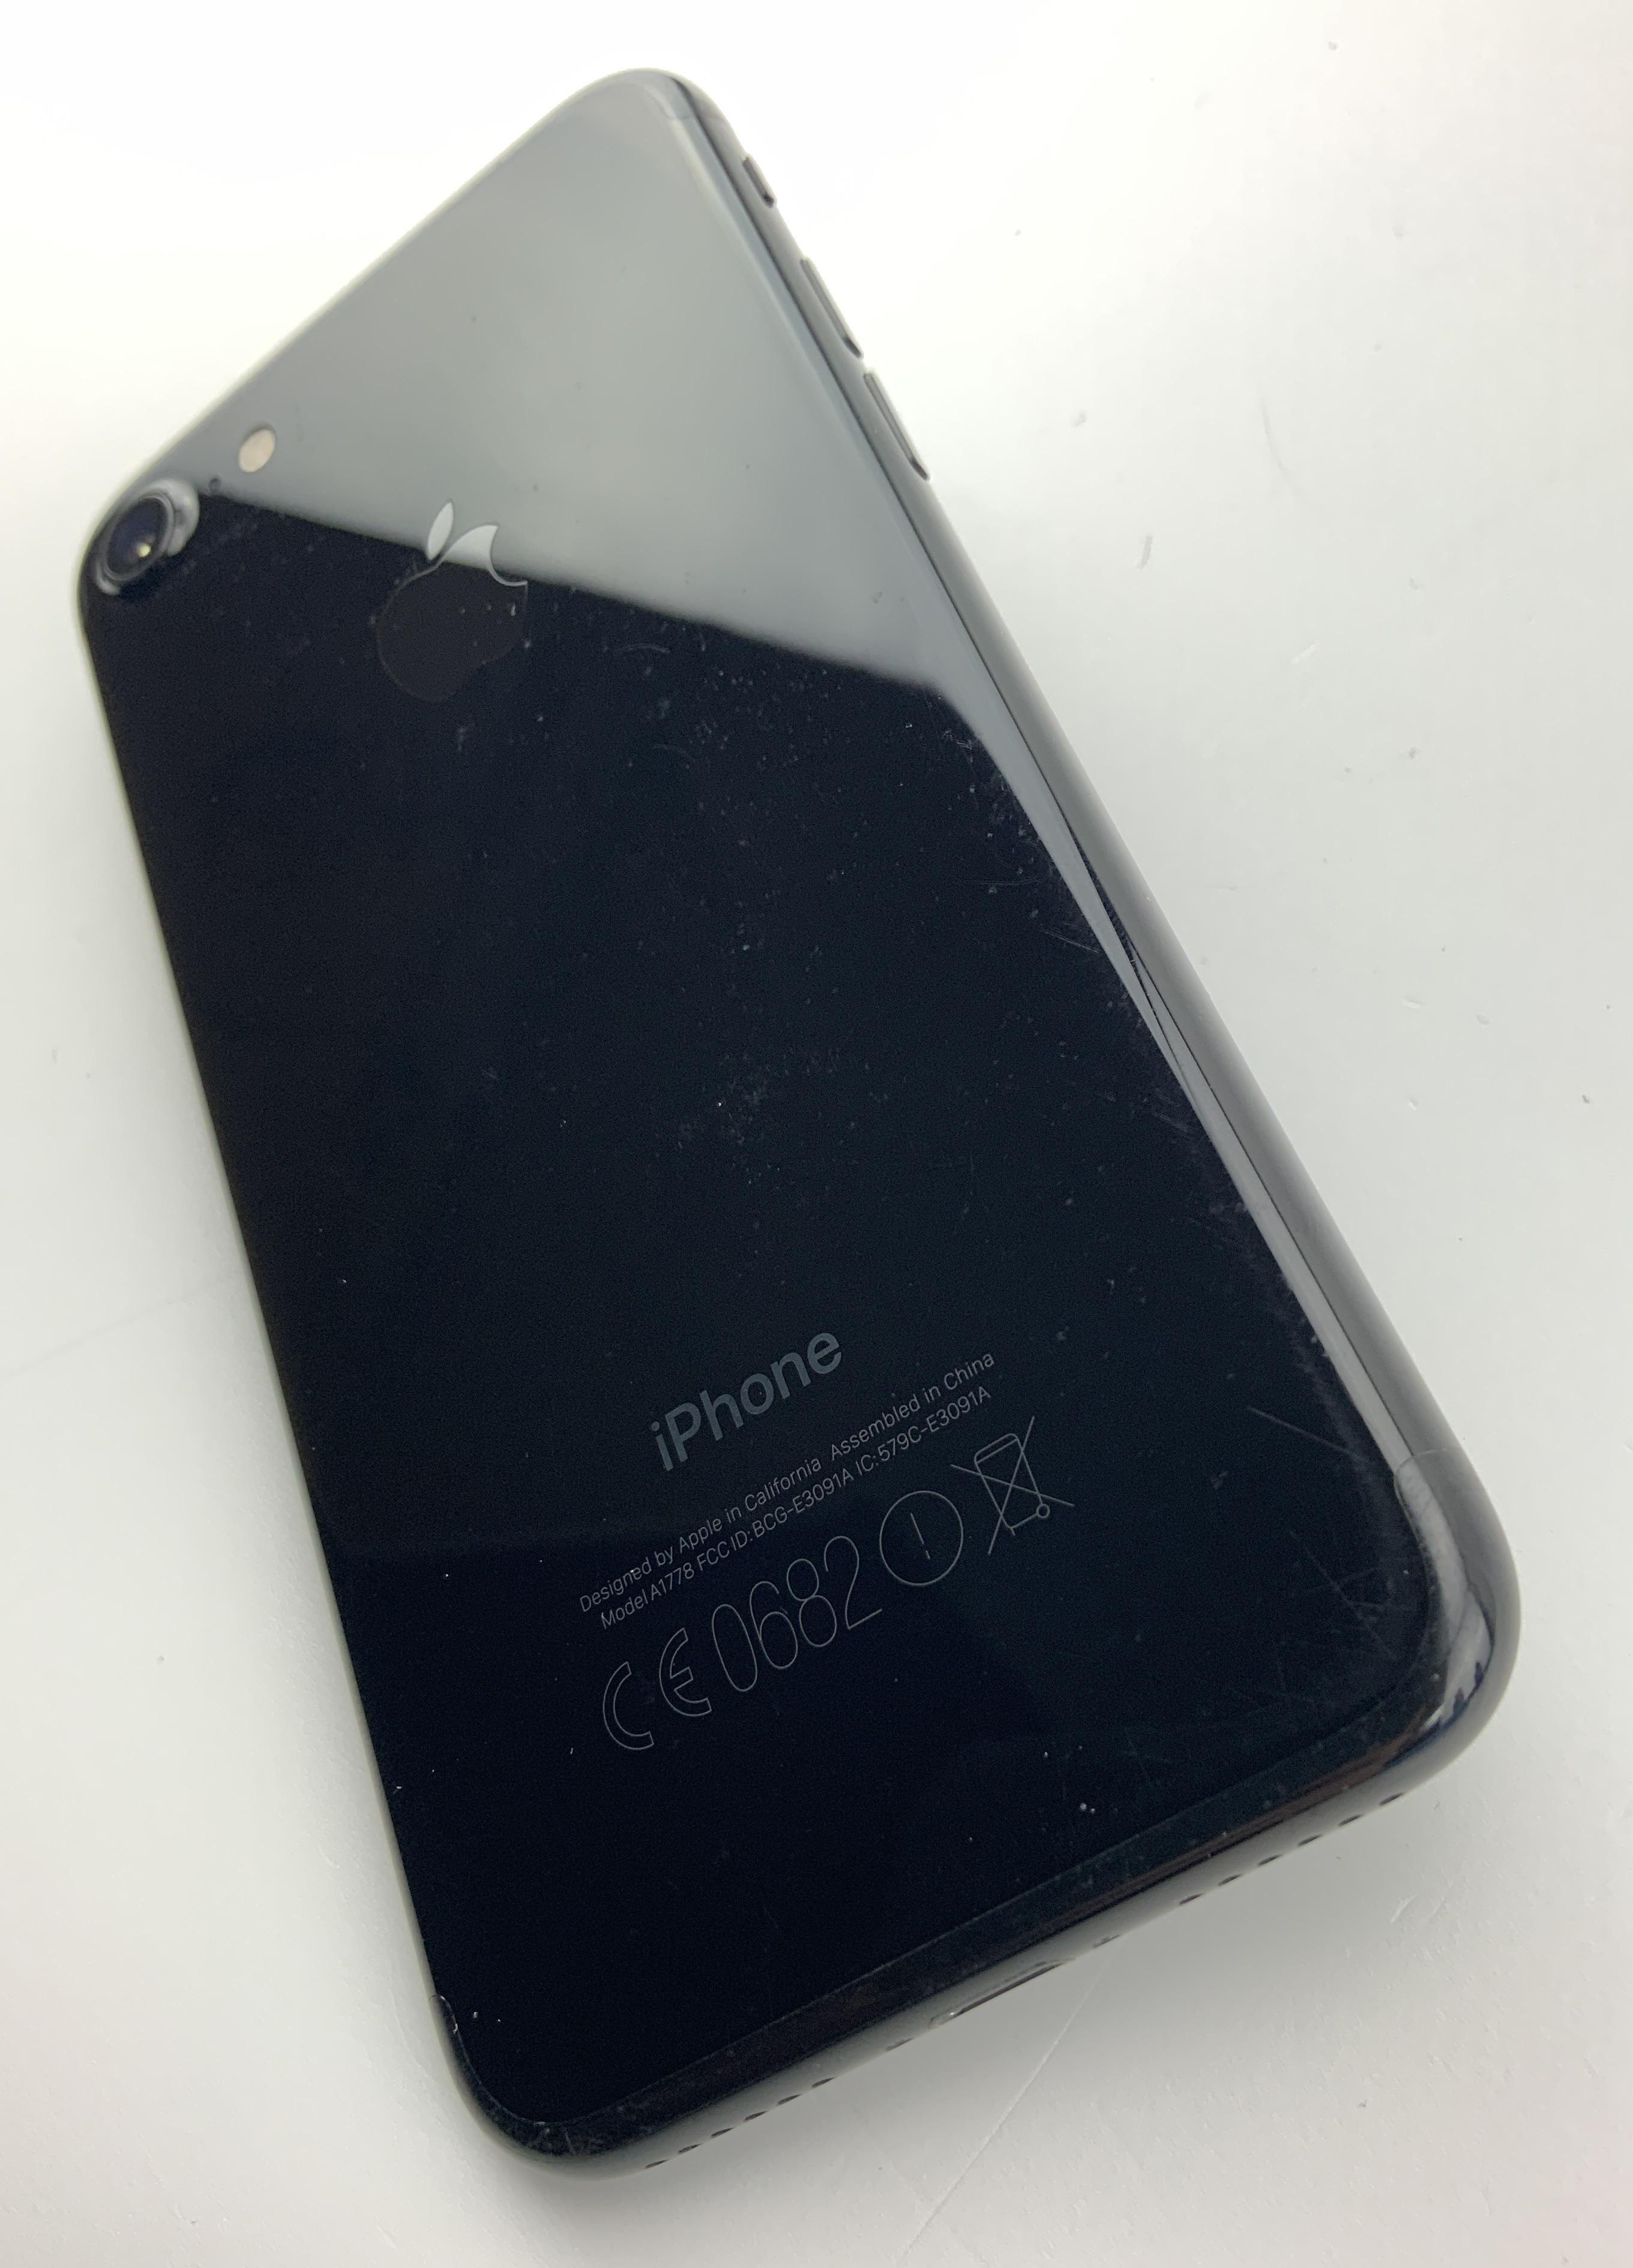 iPhone 7 128GB, 128GB, Jet Black, Kuva 5